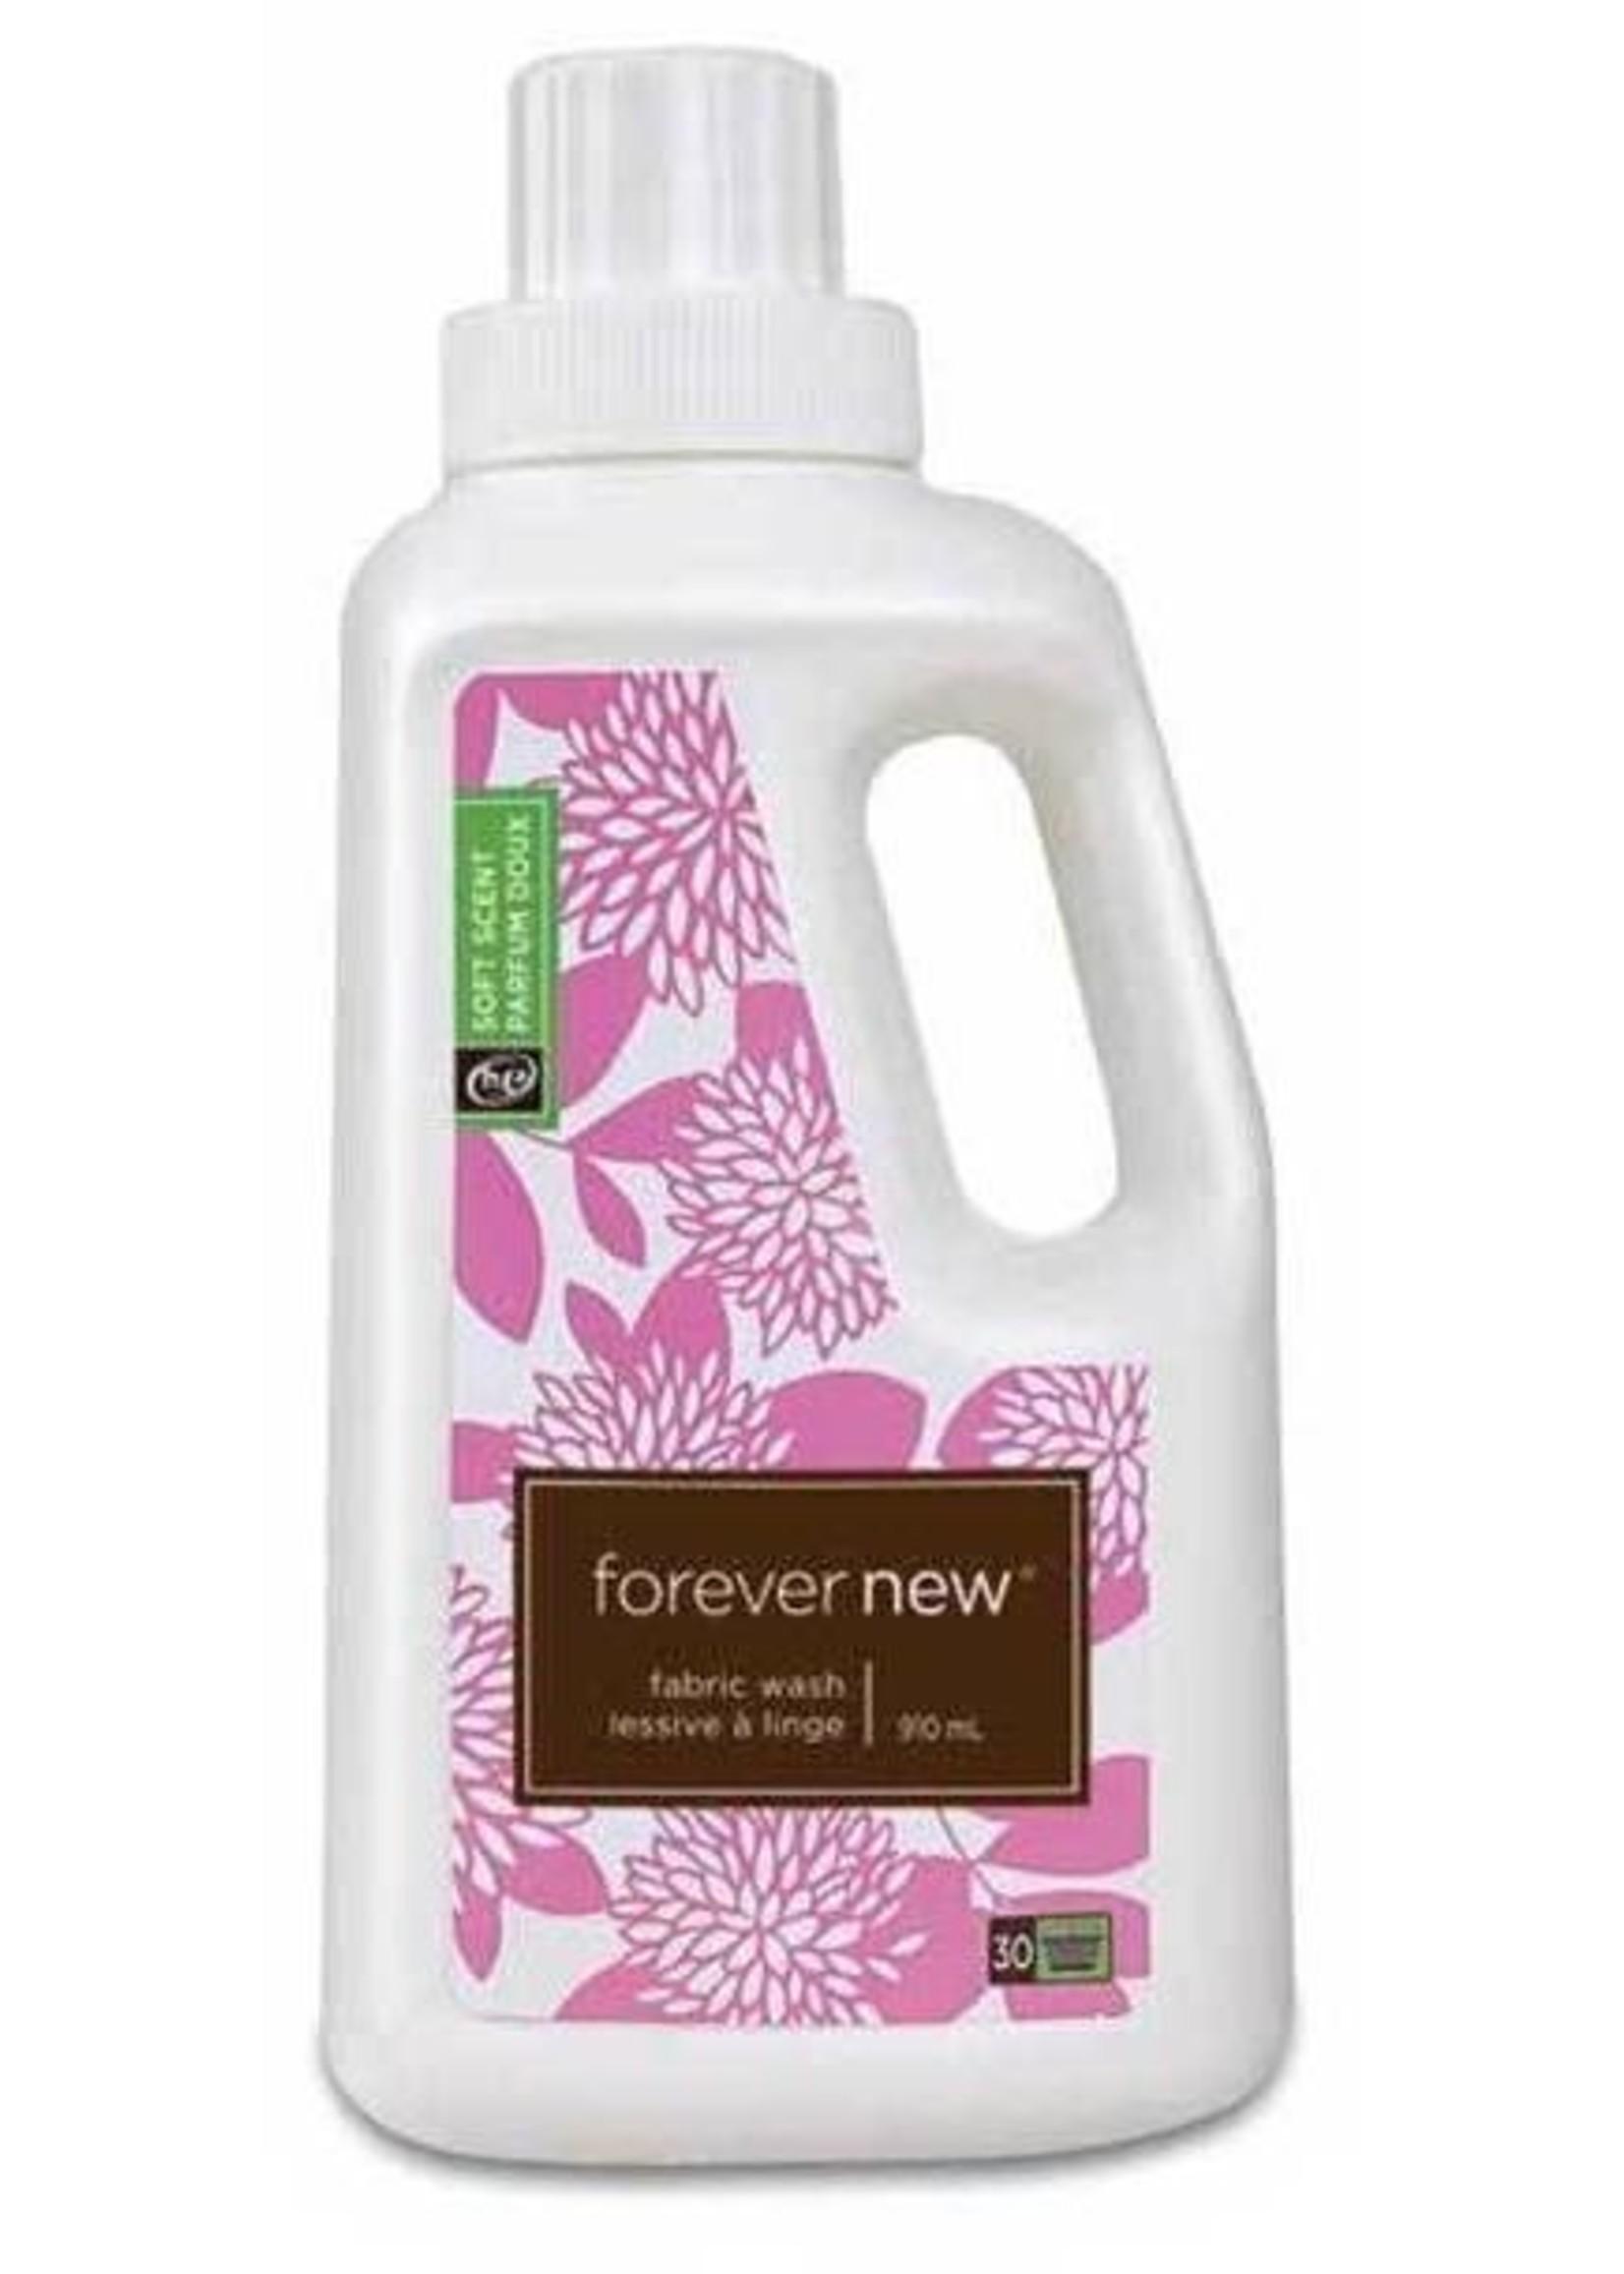 Forever New Liquid Detergent 910ml